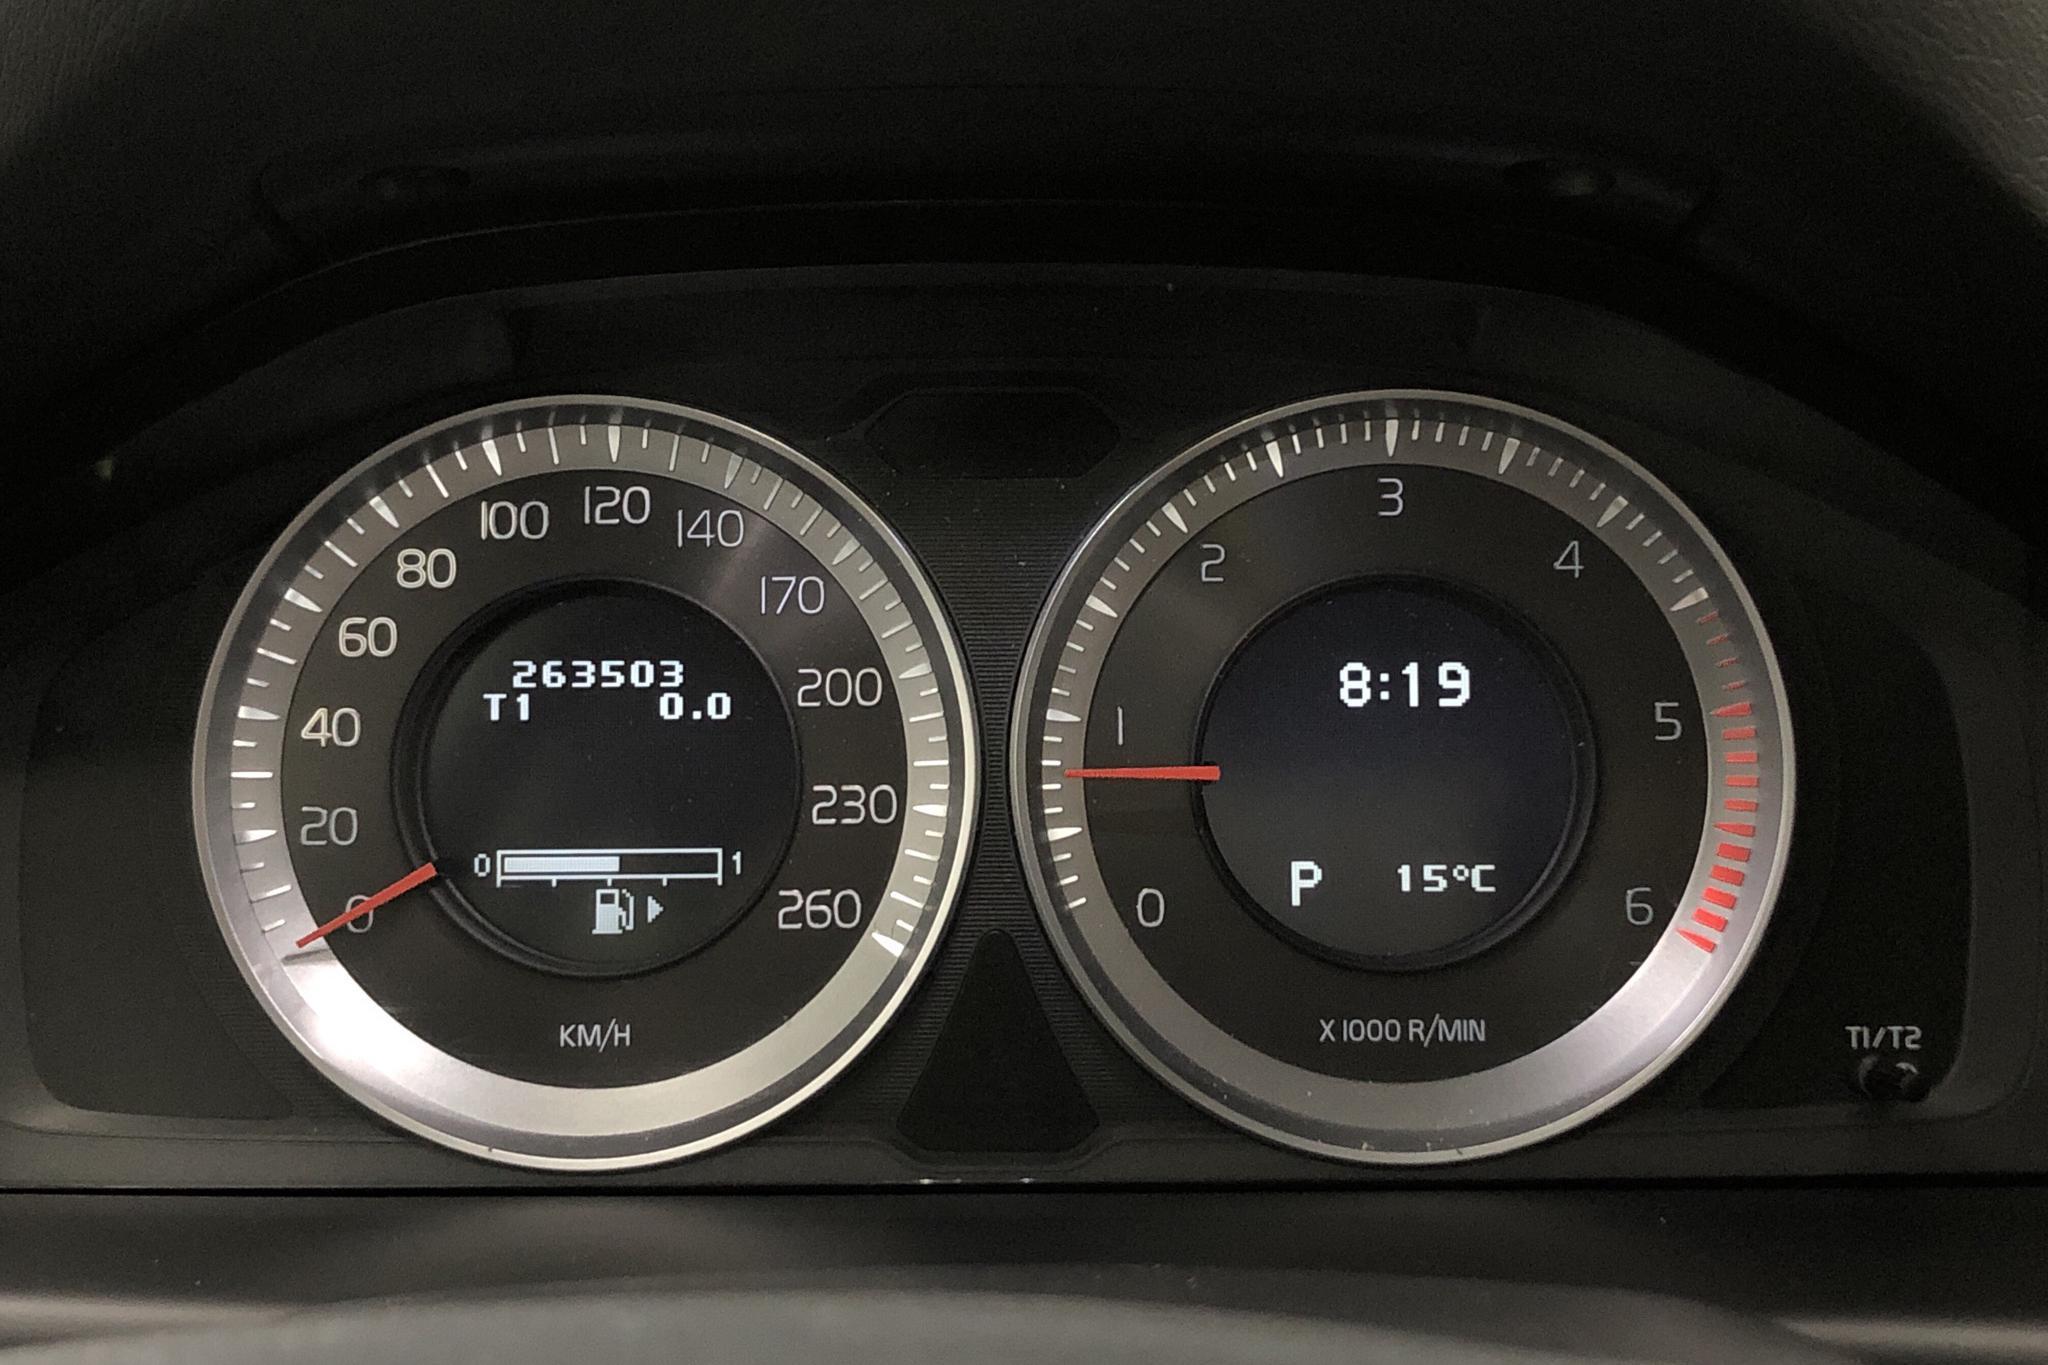 Volvo XC70 II D5 AWD (215hk) - 263 500 km - Automatic - black - 2012